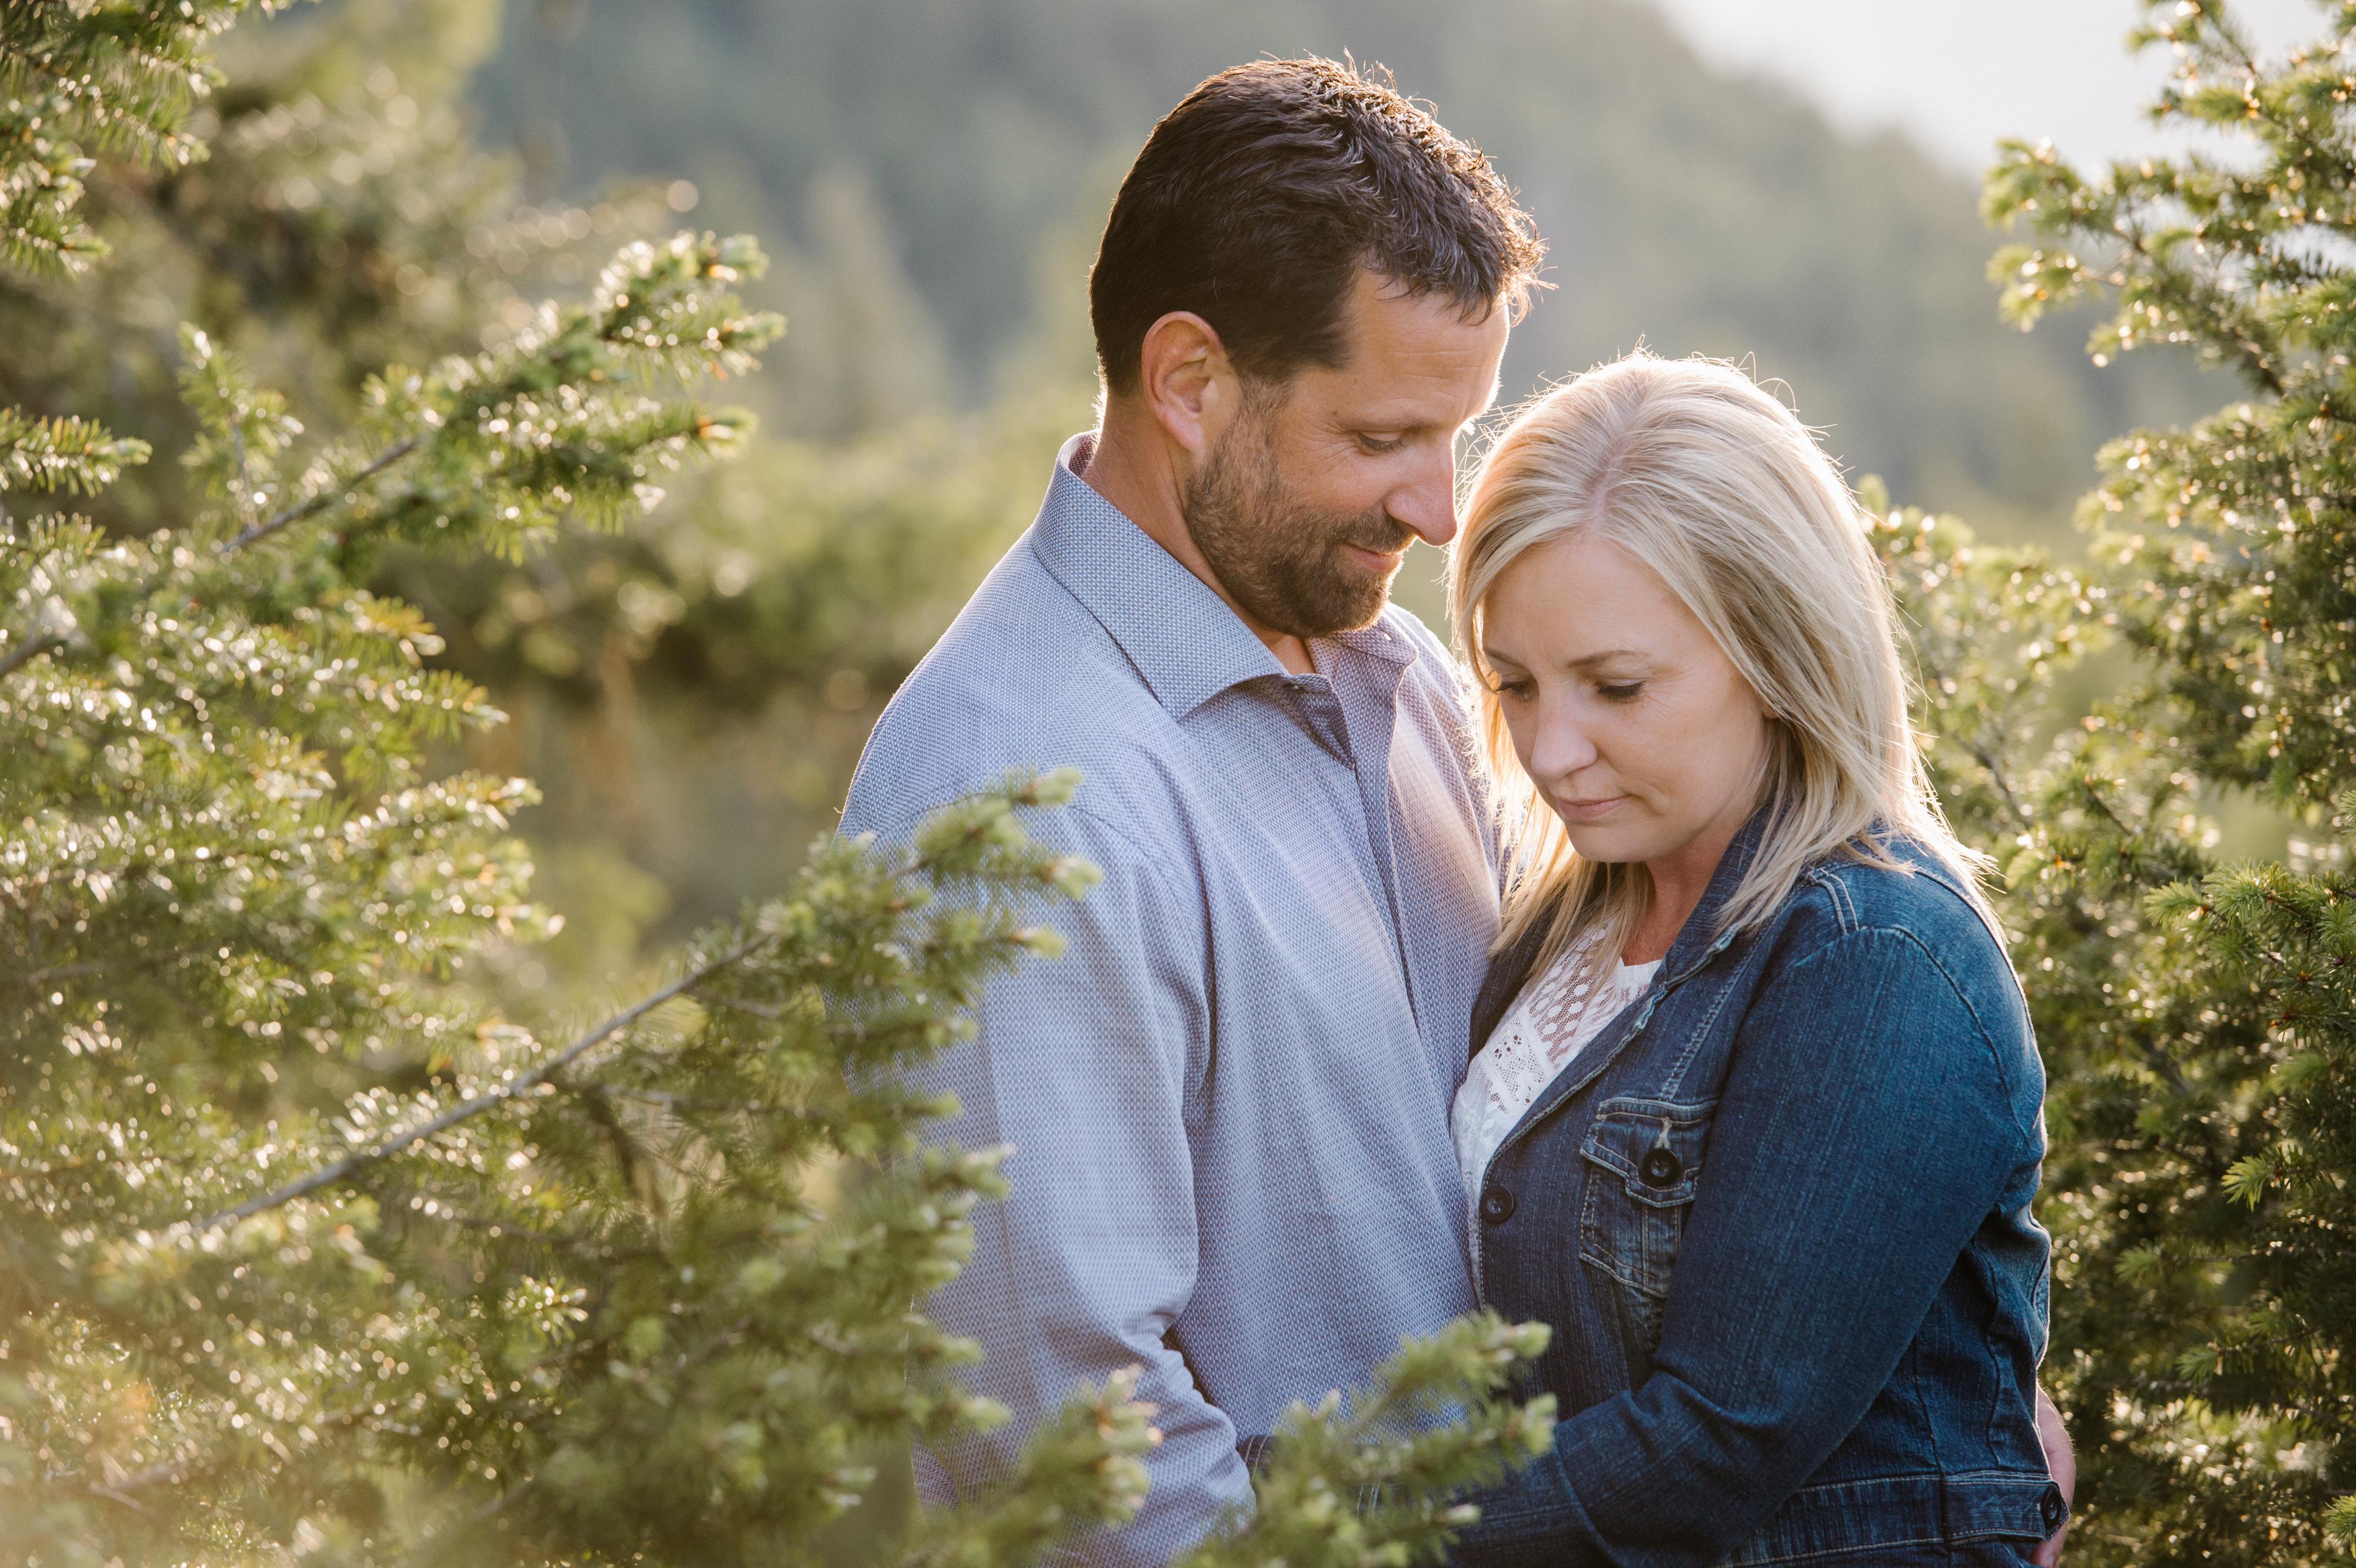 Harper Mountain portrait session golden hour sunshine couple portraits love Fraser Valley photographer BC Interior